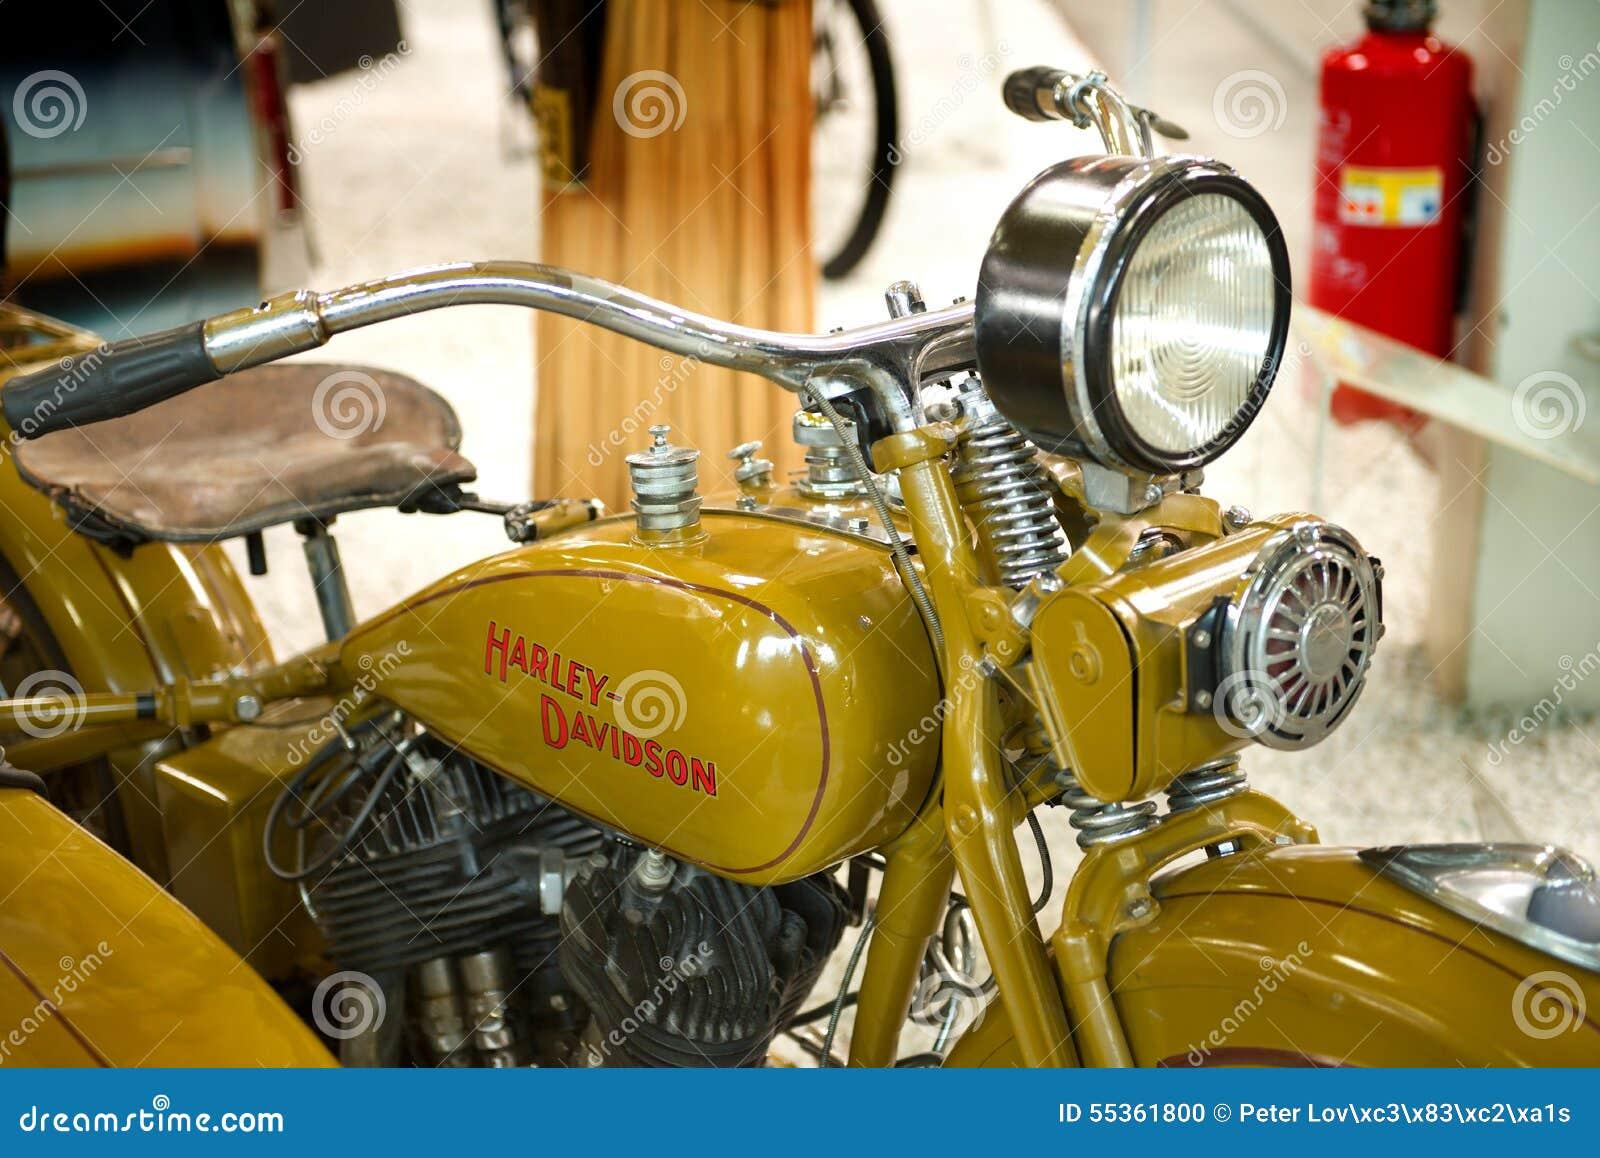 Harley Davidson V/VL - museo Sinsheim